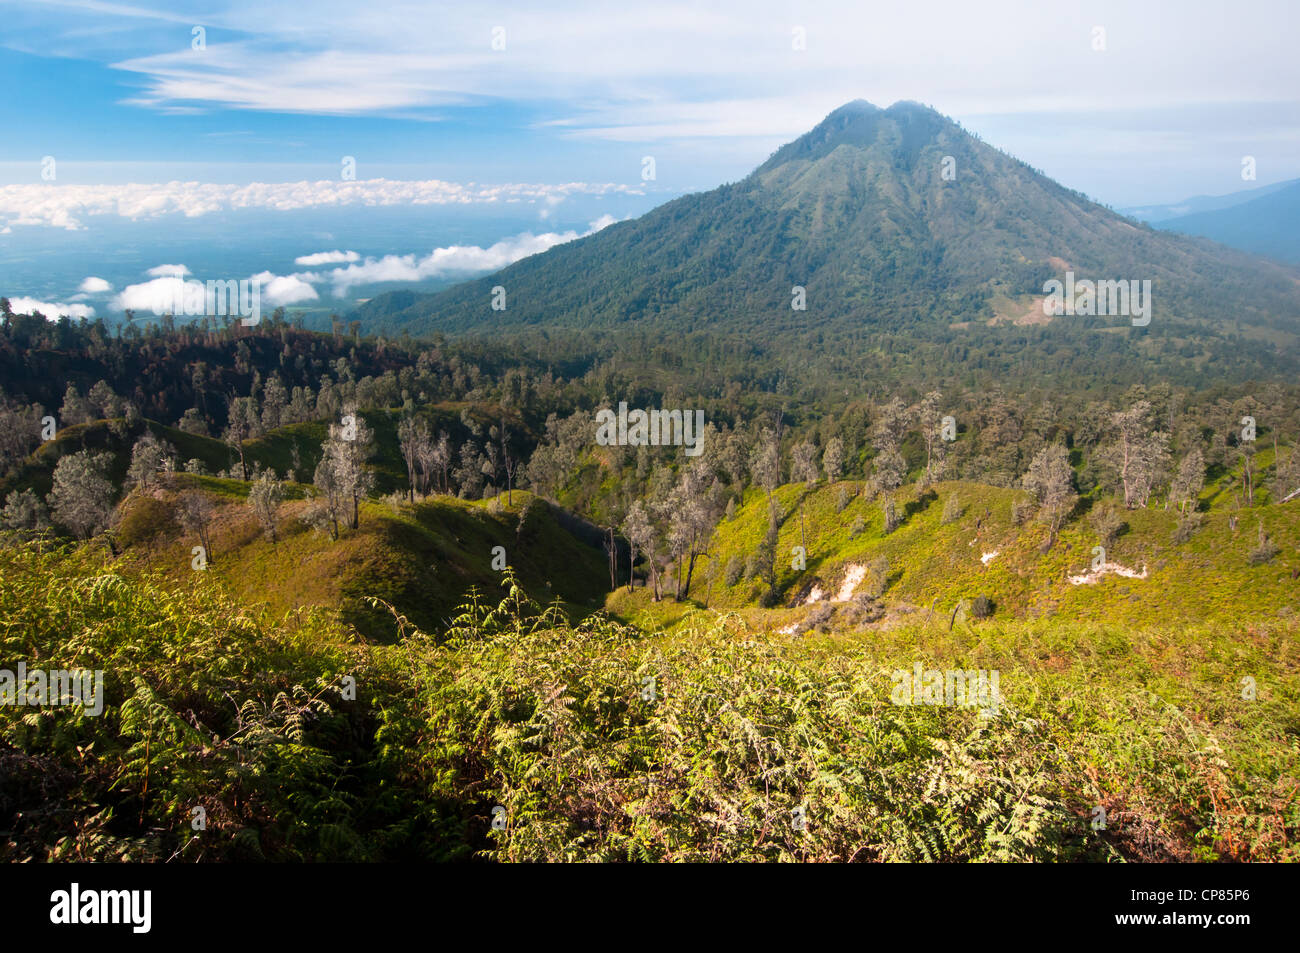 Gunung Merapi Volcano on Java Island in Indonesia - Stock Image